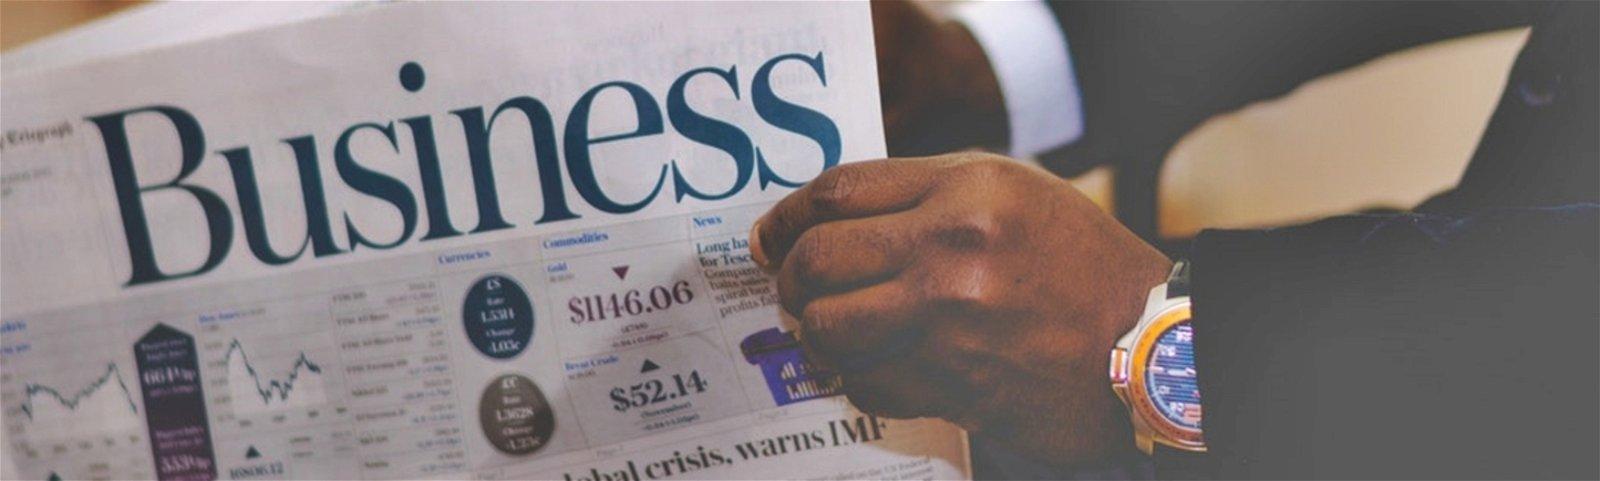 Periódico sección negocios